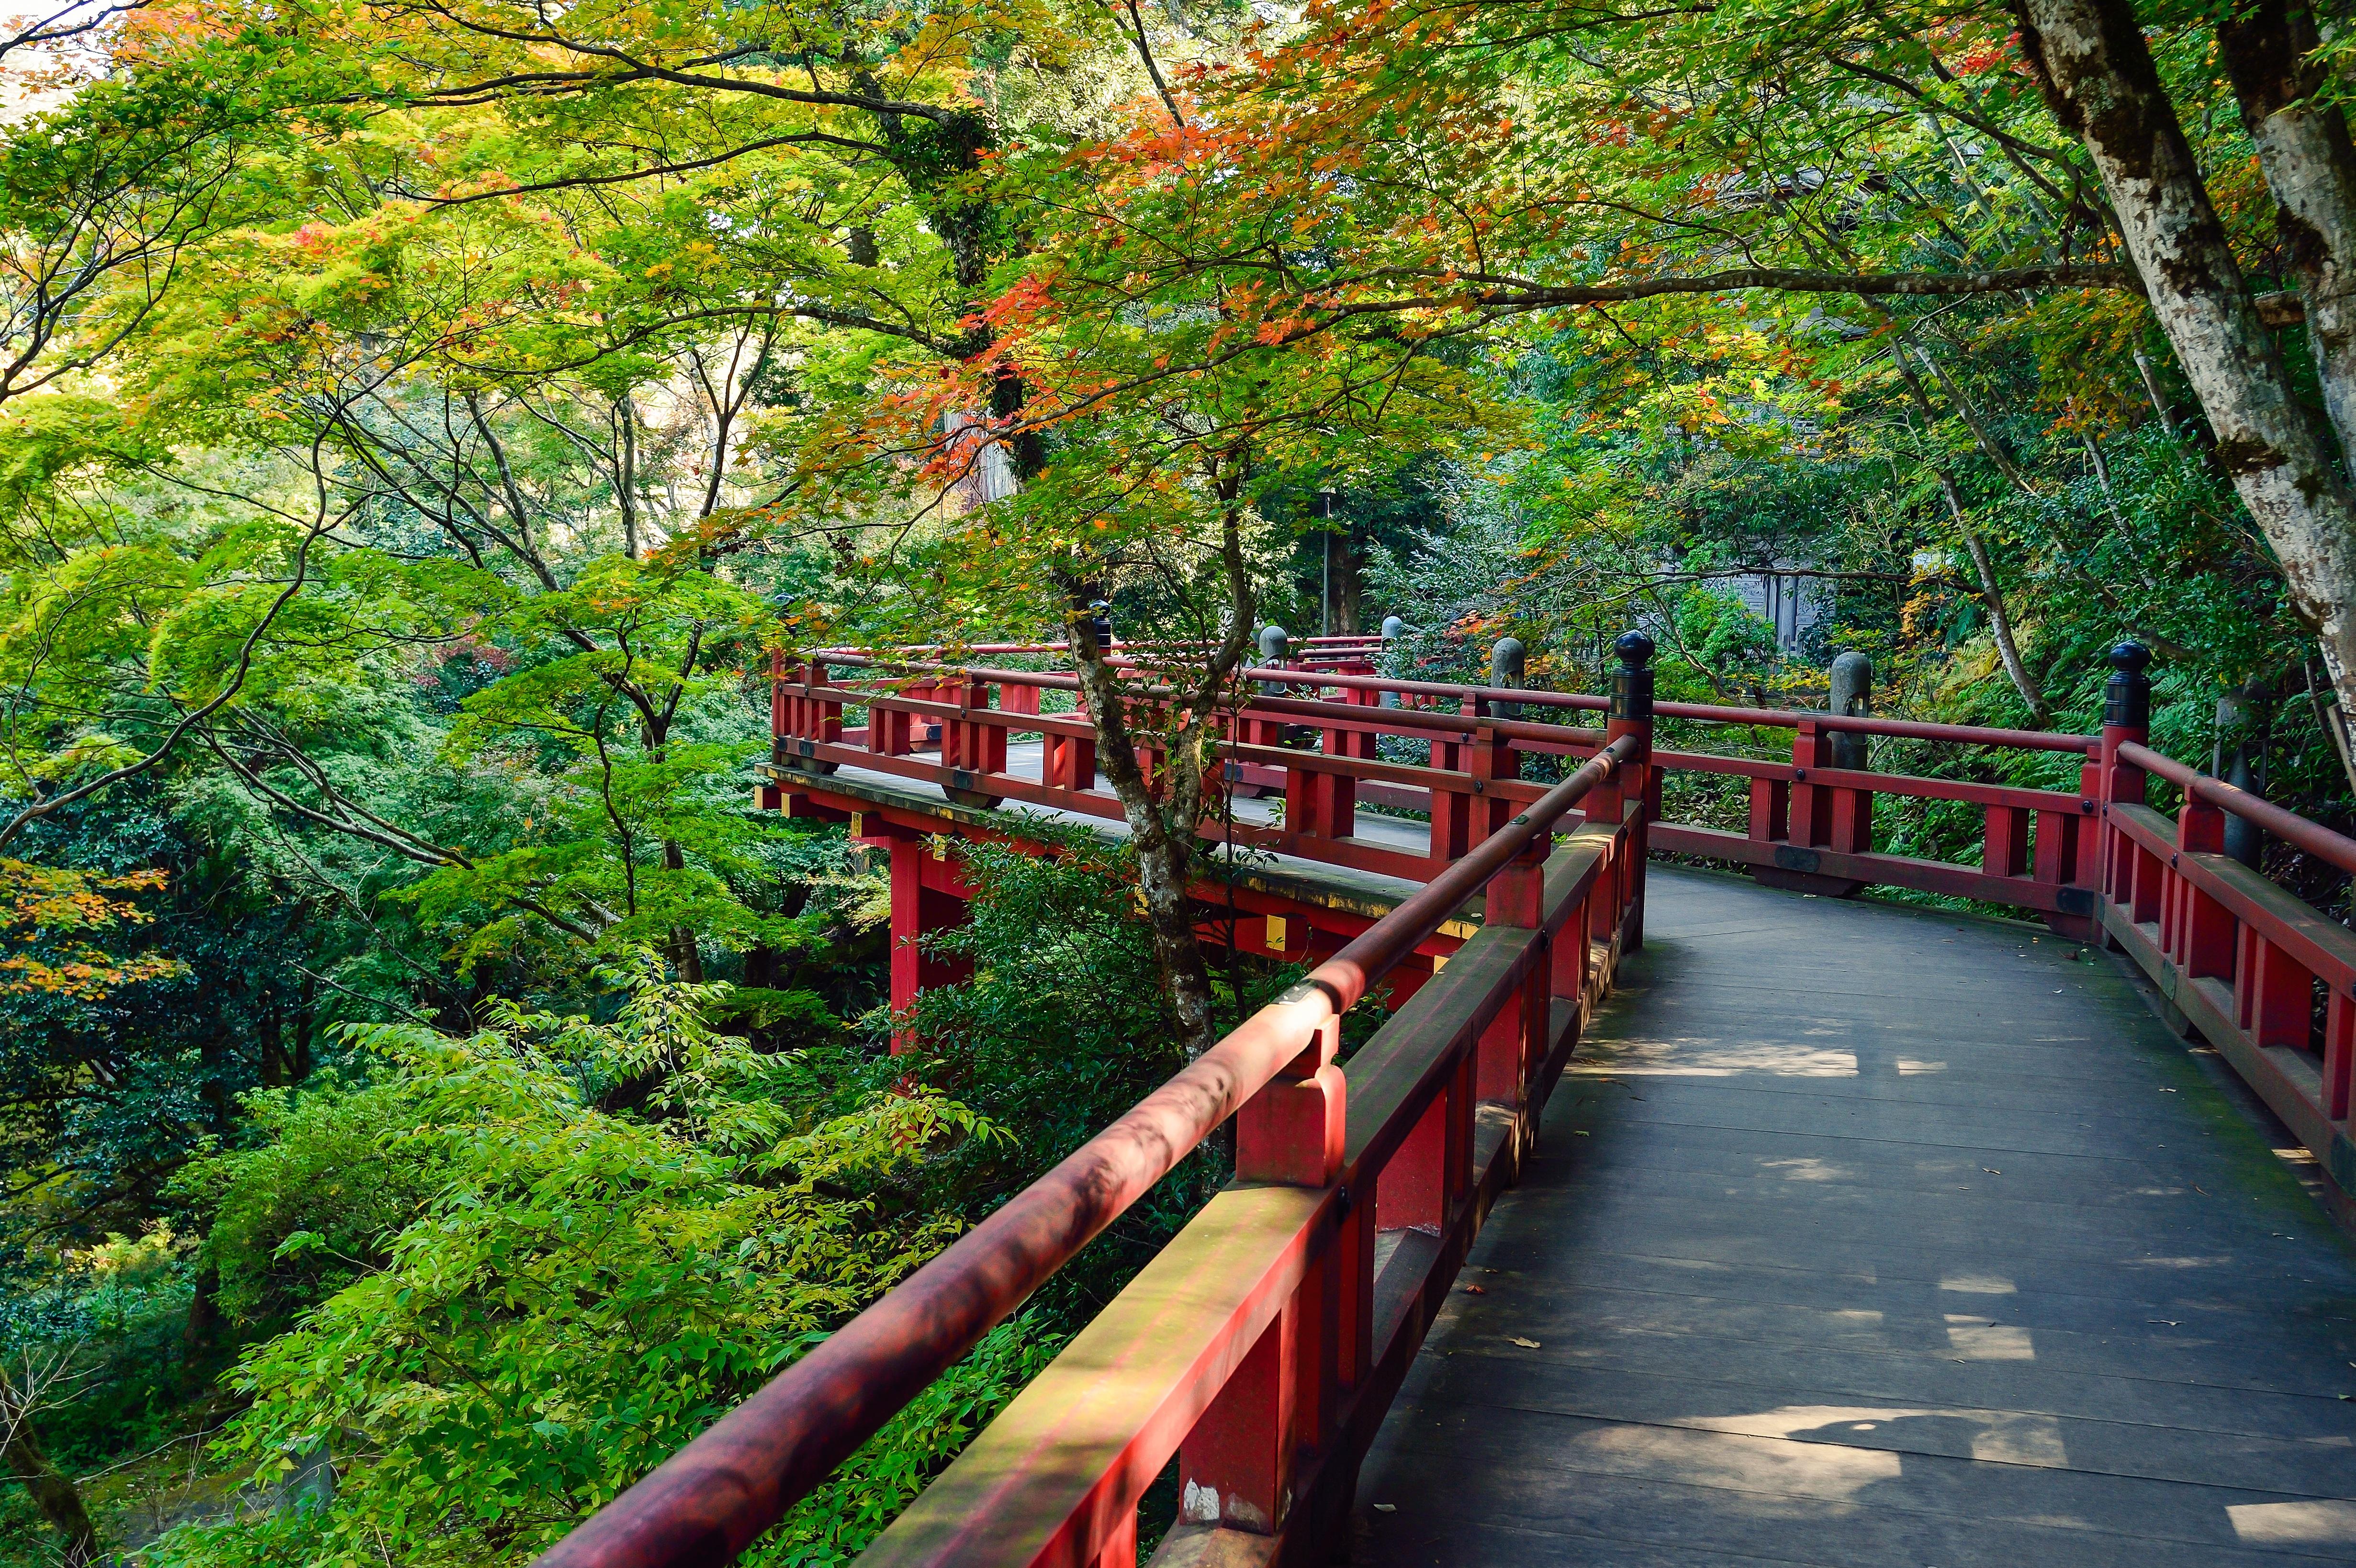 Lanape Tree Plant Wood Bridge Leaf Flower Green Red Natural Autumn Park Botany Garden Japan Season Waterway Outdoors Temple Shrine Woodland Culture Views Of Tourist Destination Wallpaper Gambar Bunga